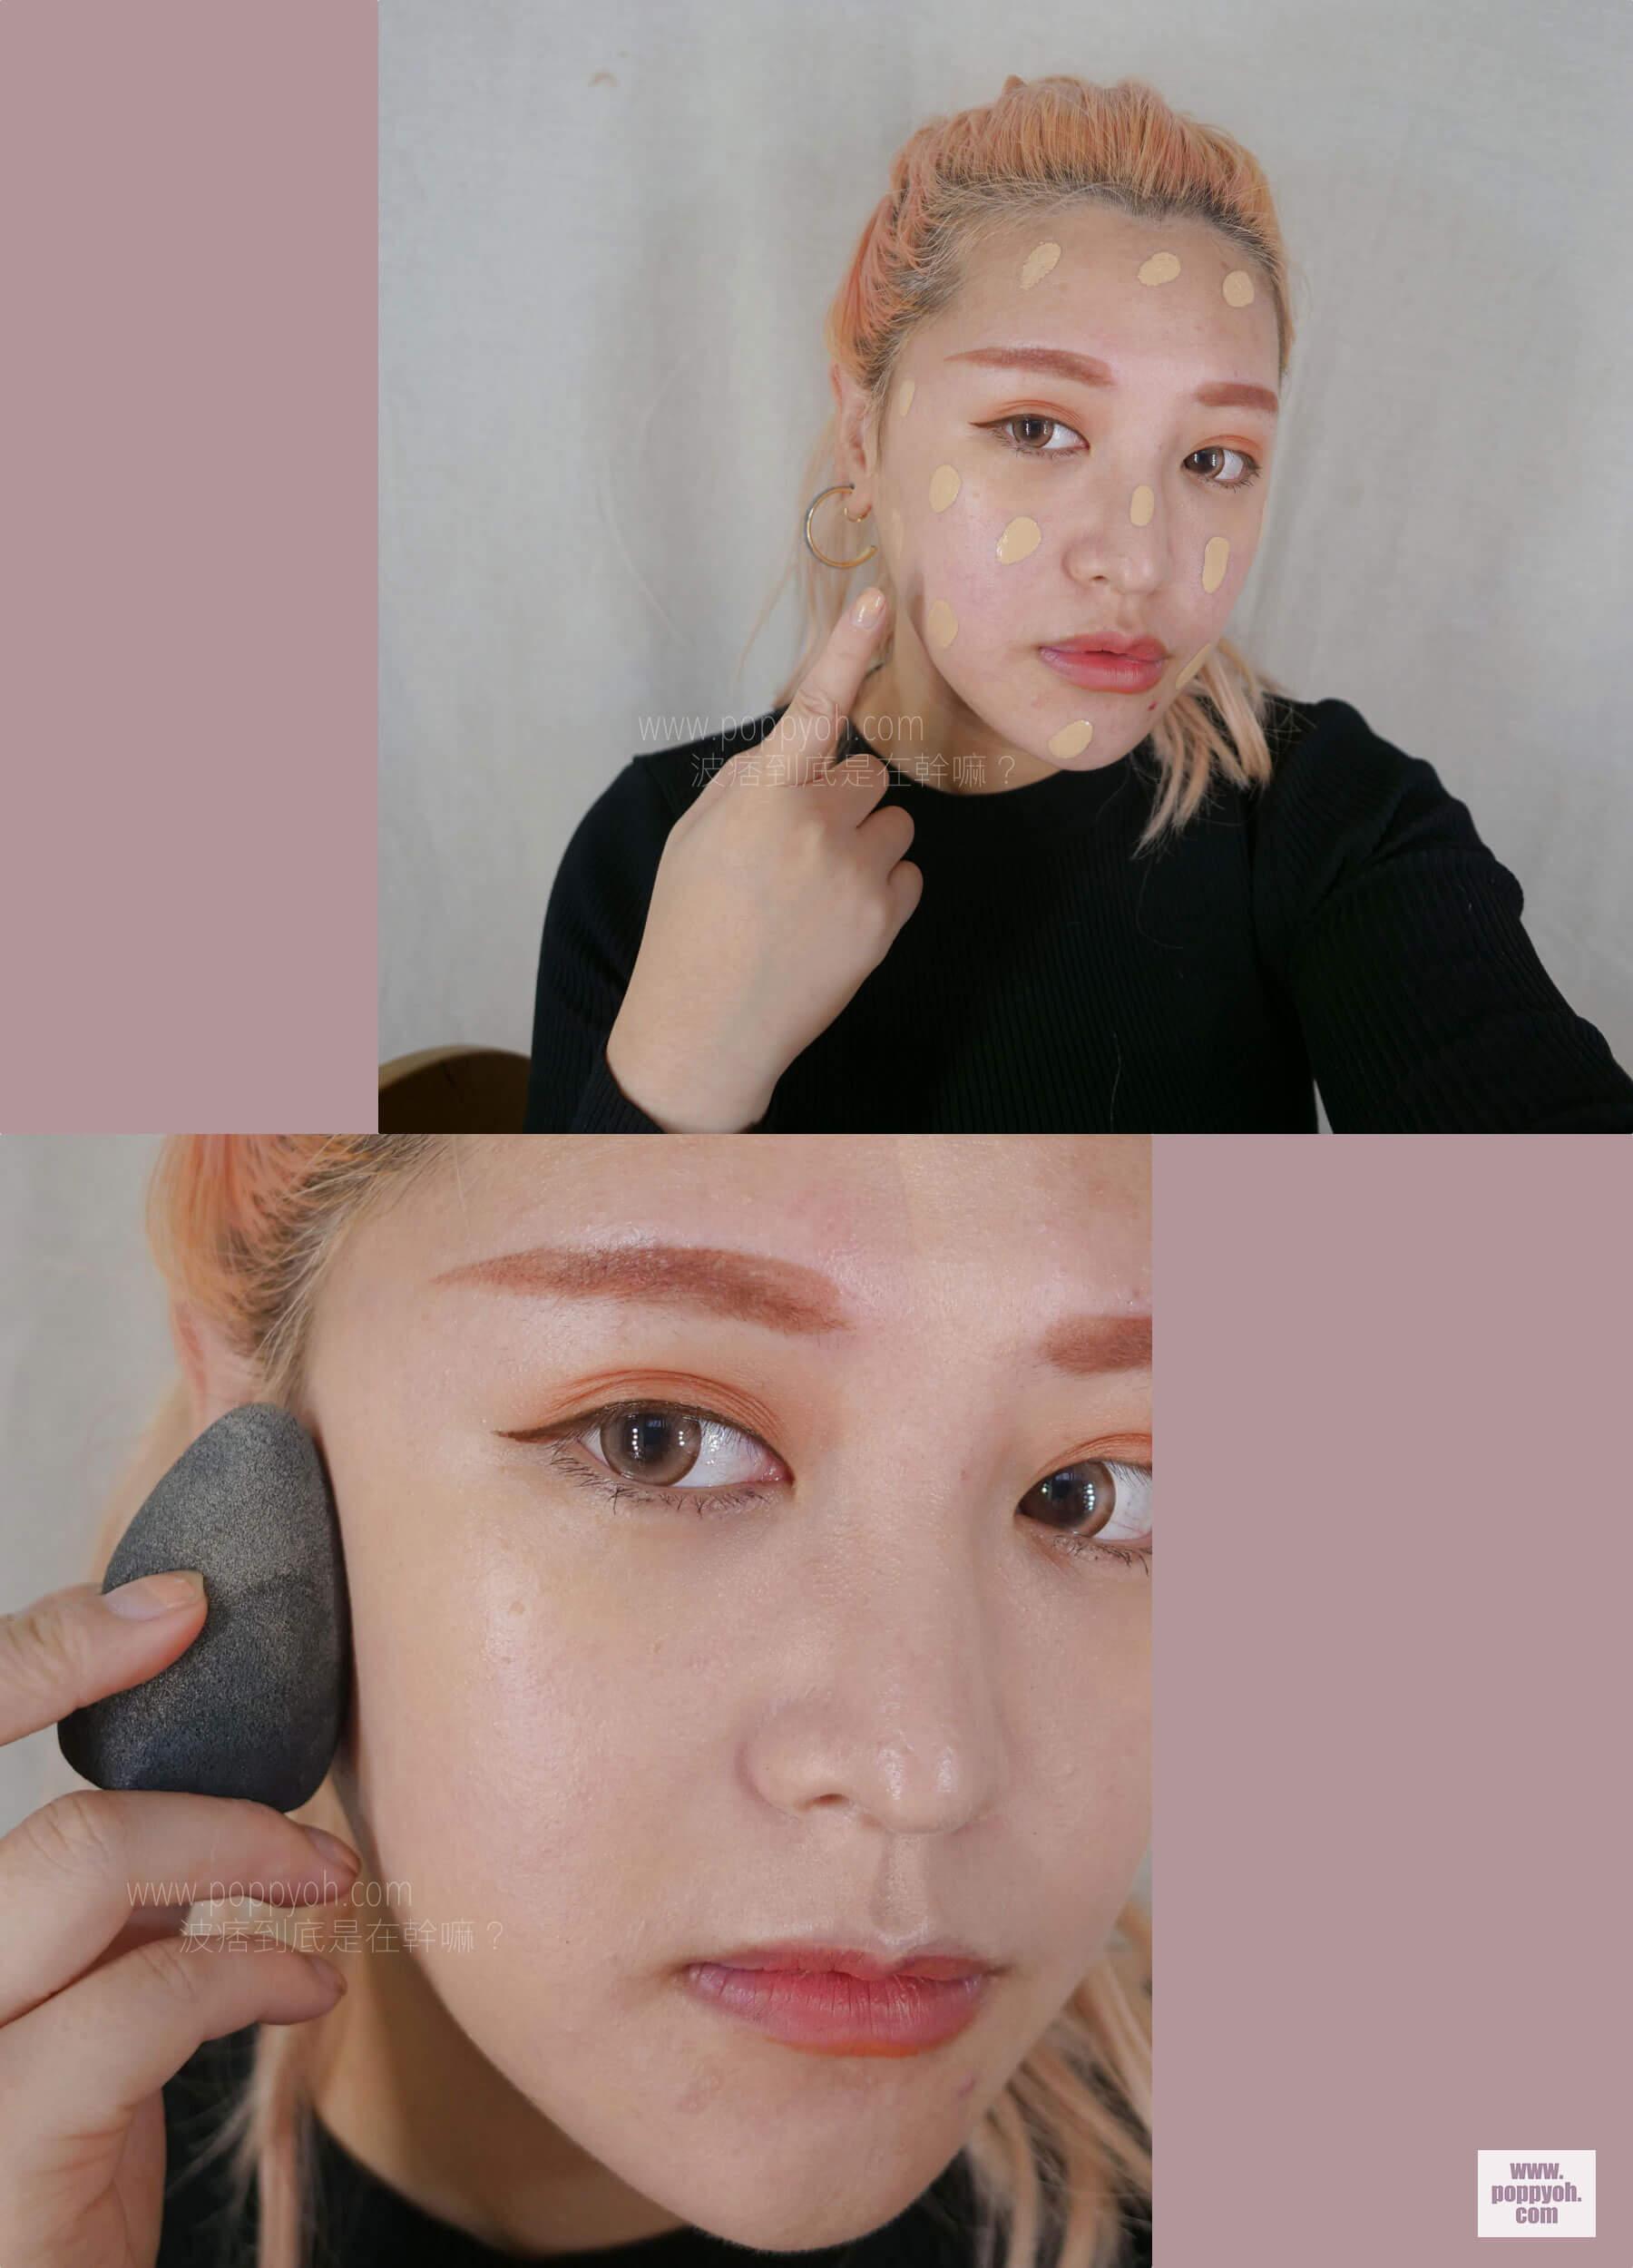 Bourjois 妙巴黎 果然新肌光粉底液旗艦版 妝效 妝感 實測 乾肌